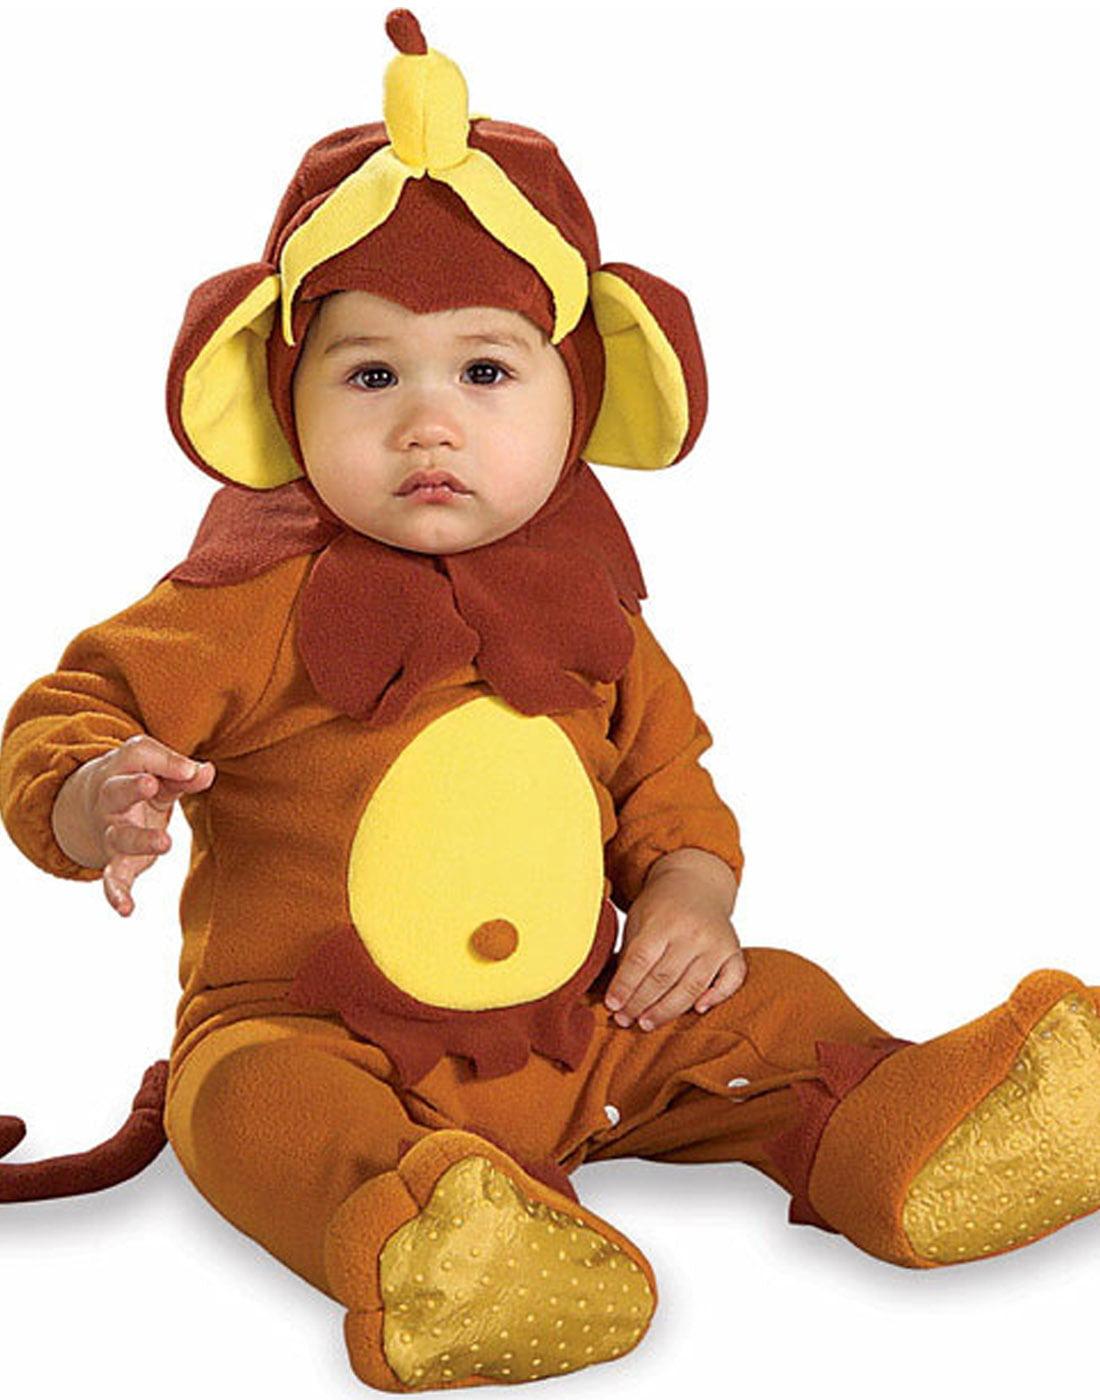 sc 1 st  Walmart & Monkey Costume Infant - Walmart.com